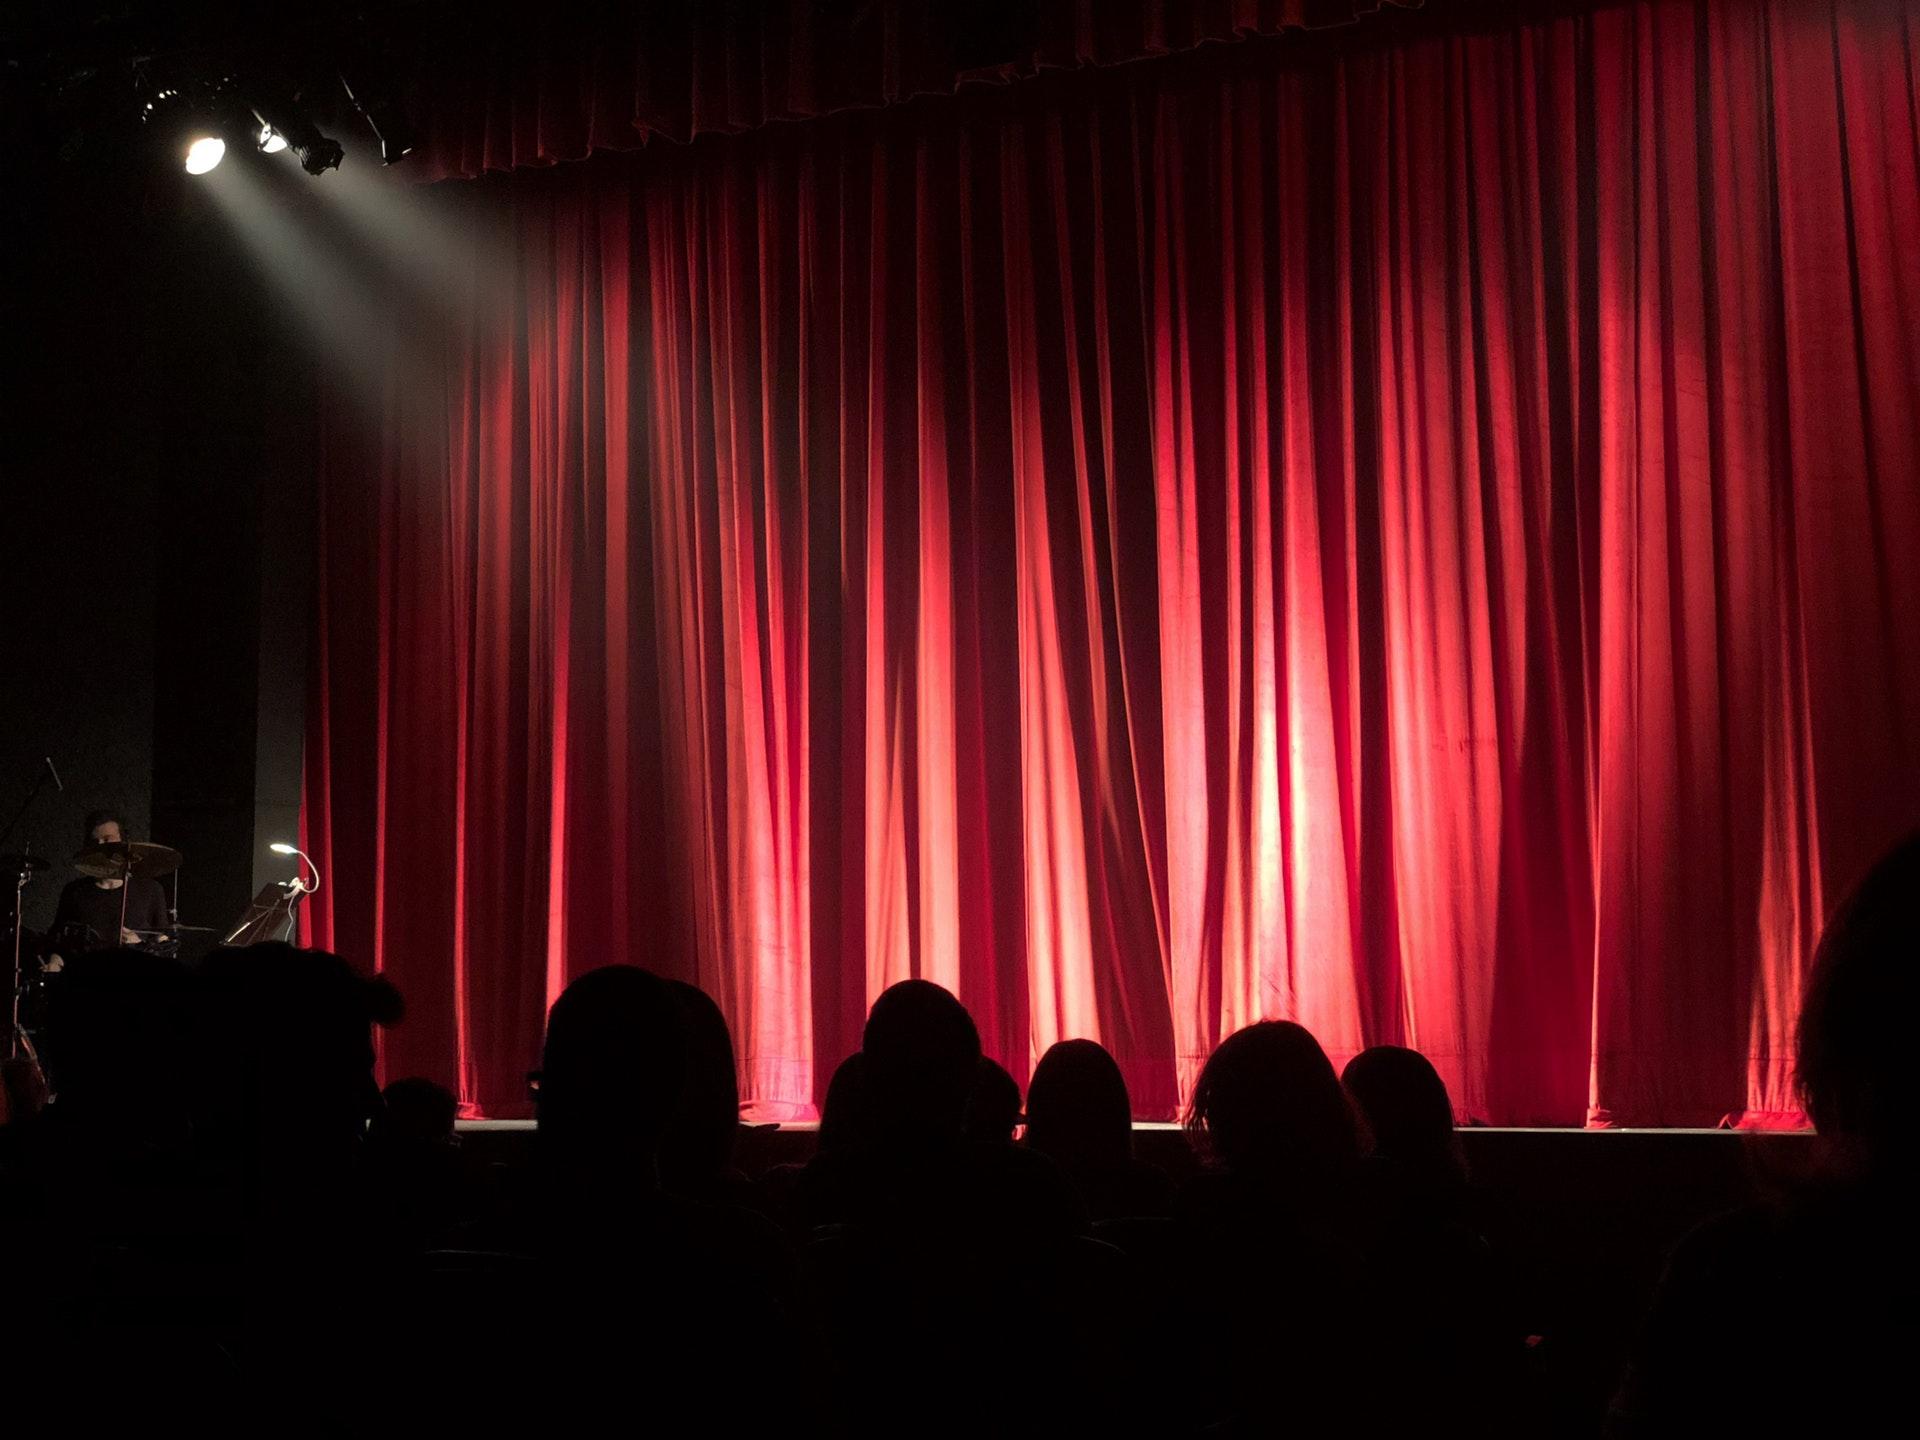 Teater, teaterstykke, publikum, forestilling